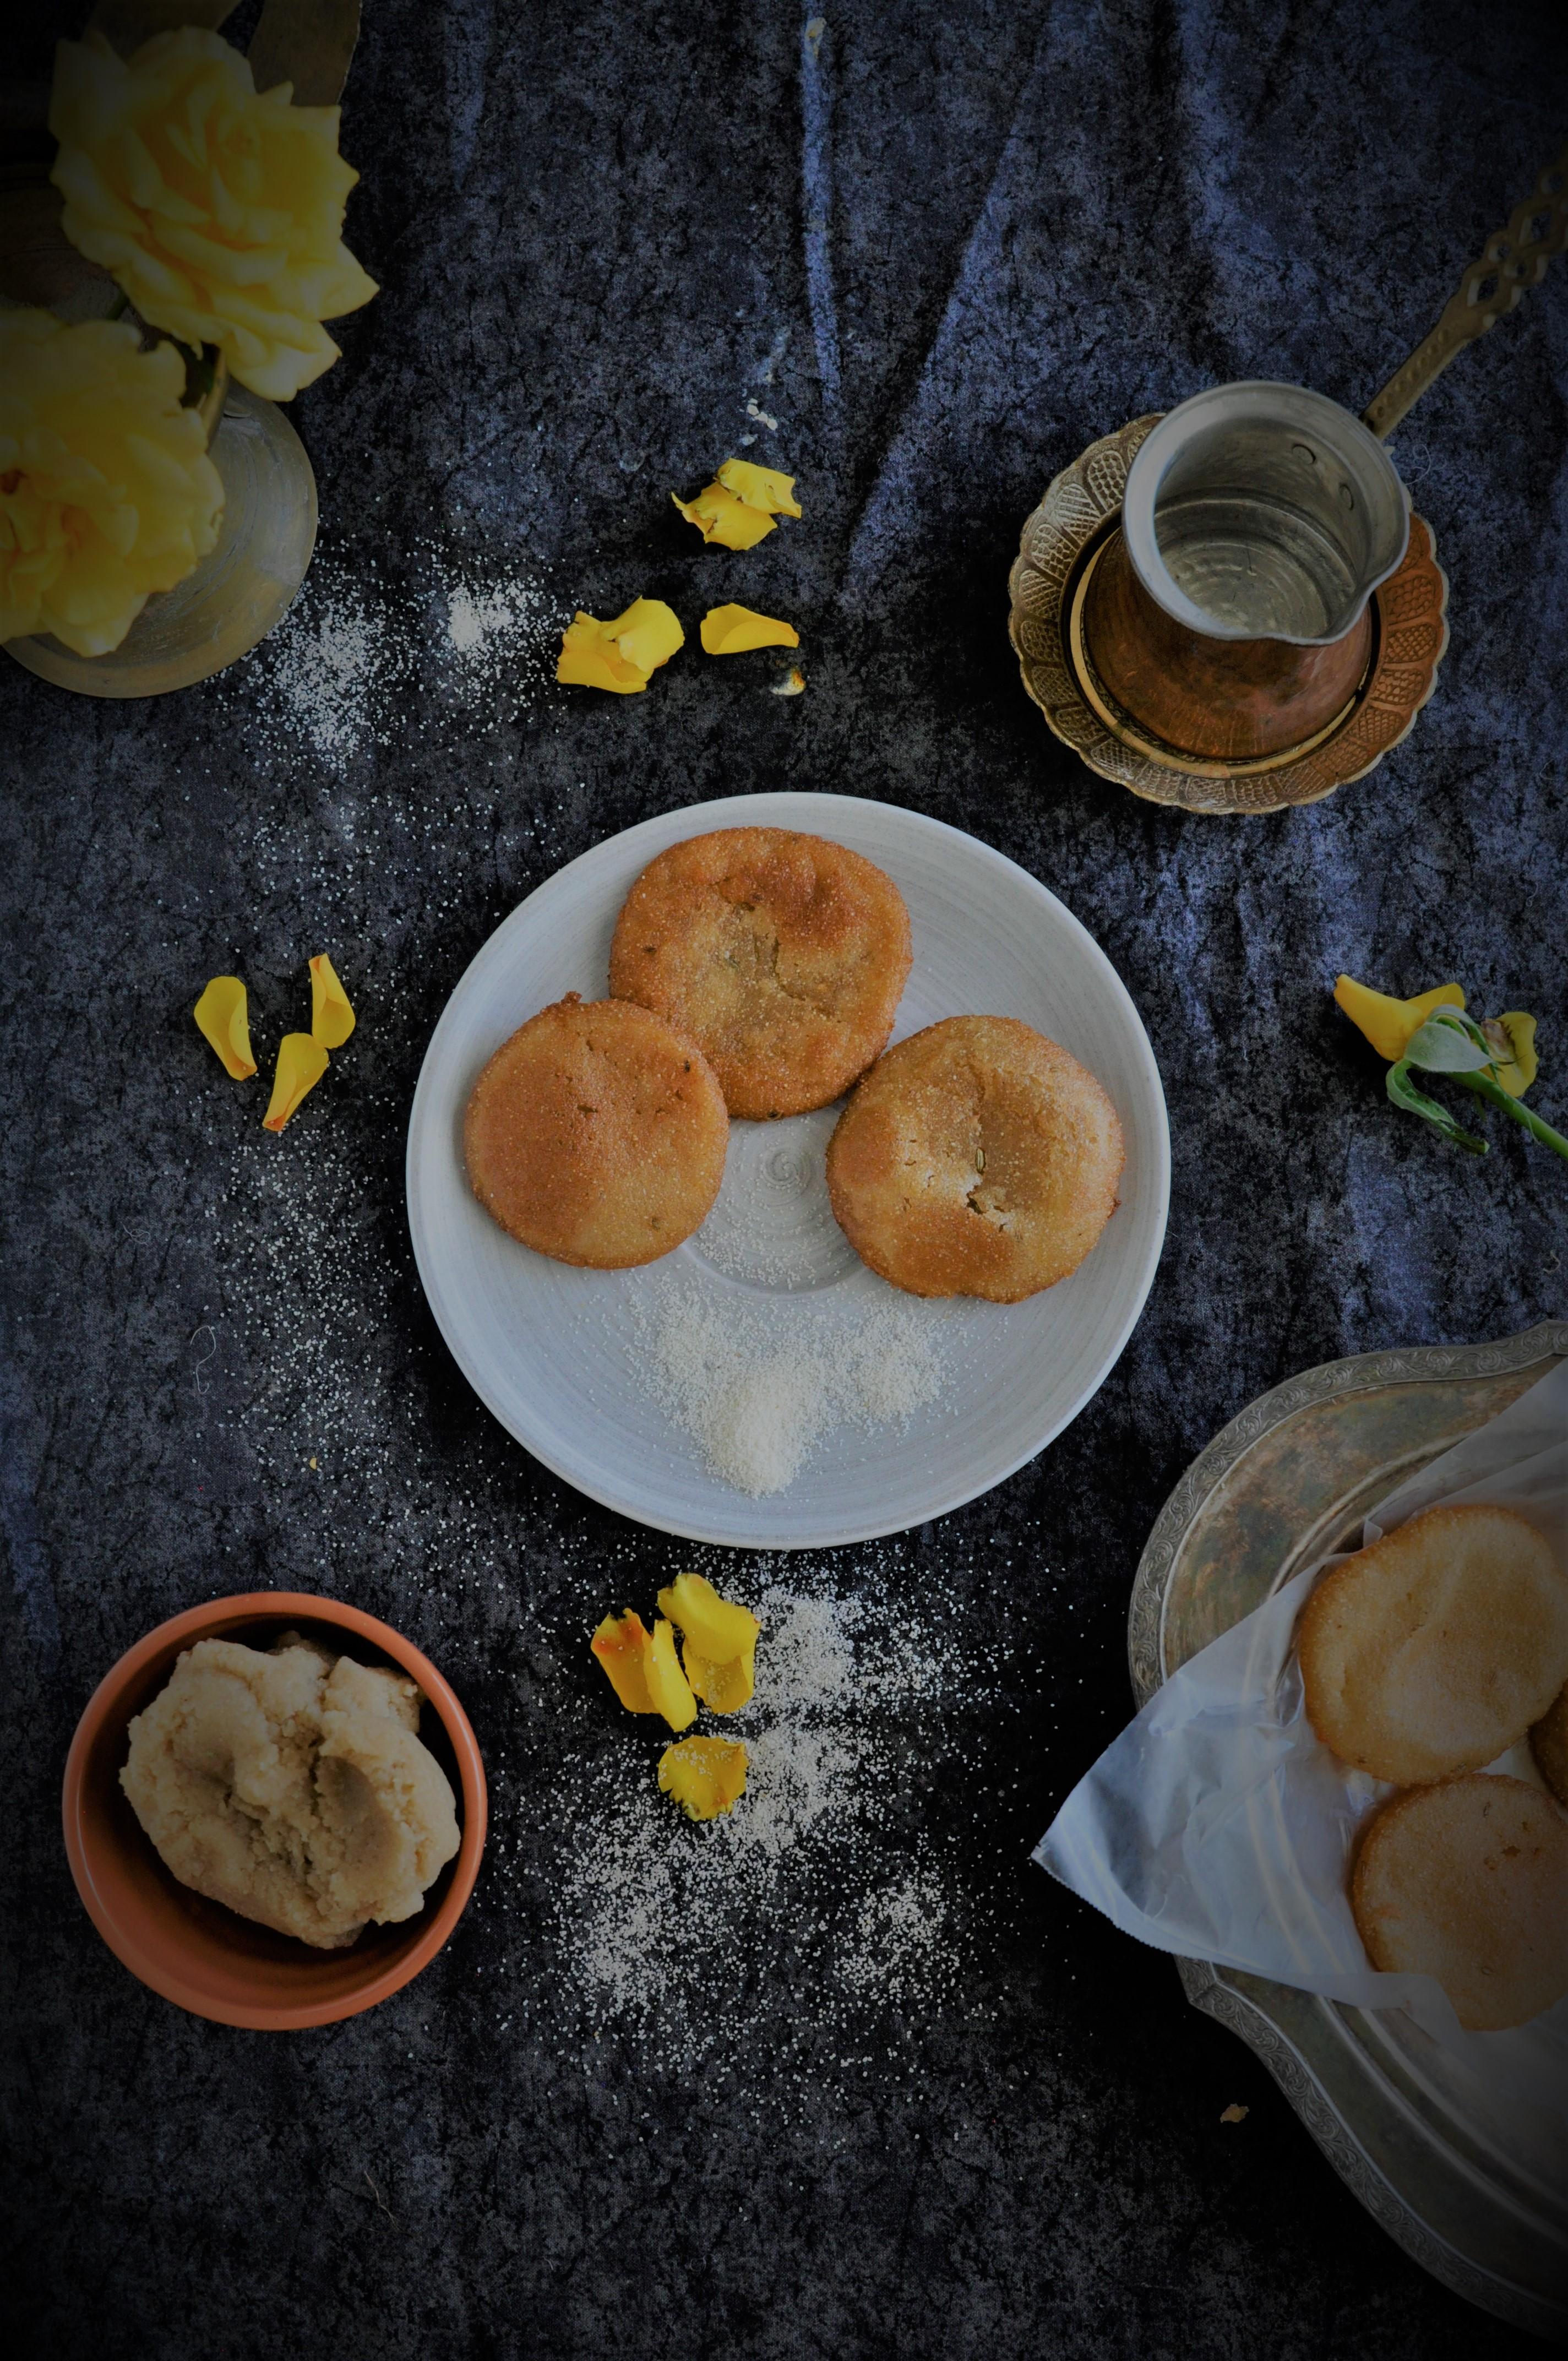 pitha,pithe, sooji pitha, kakara pitha, how to make sooji kakara, odisha pitha,what is pitha, coconut sooji, coconut jaggery, guda pura dia pitha